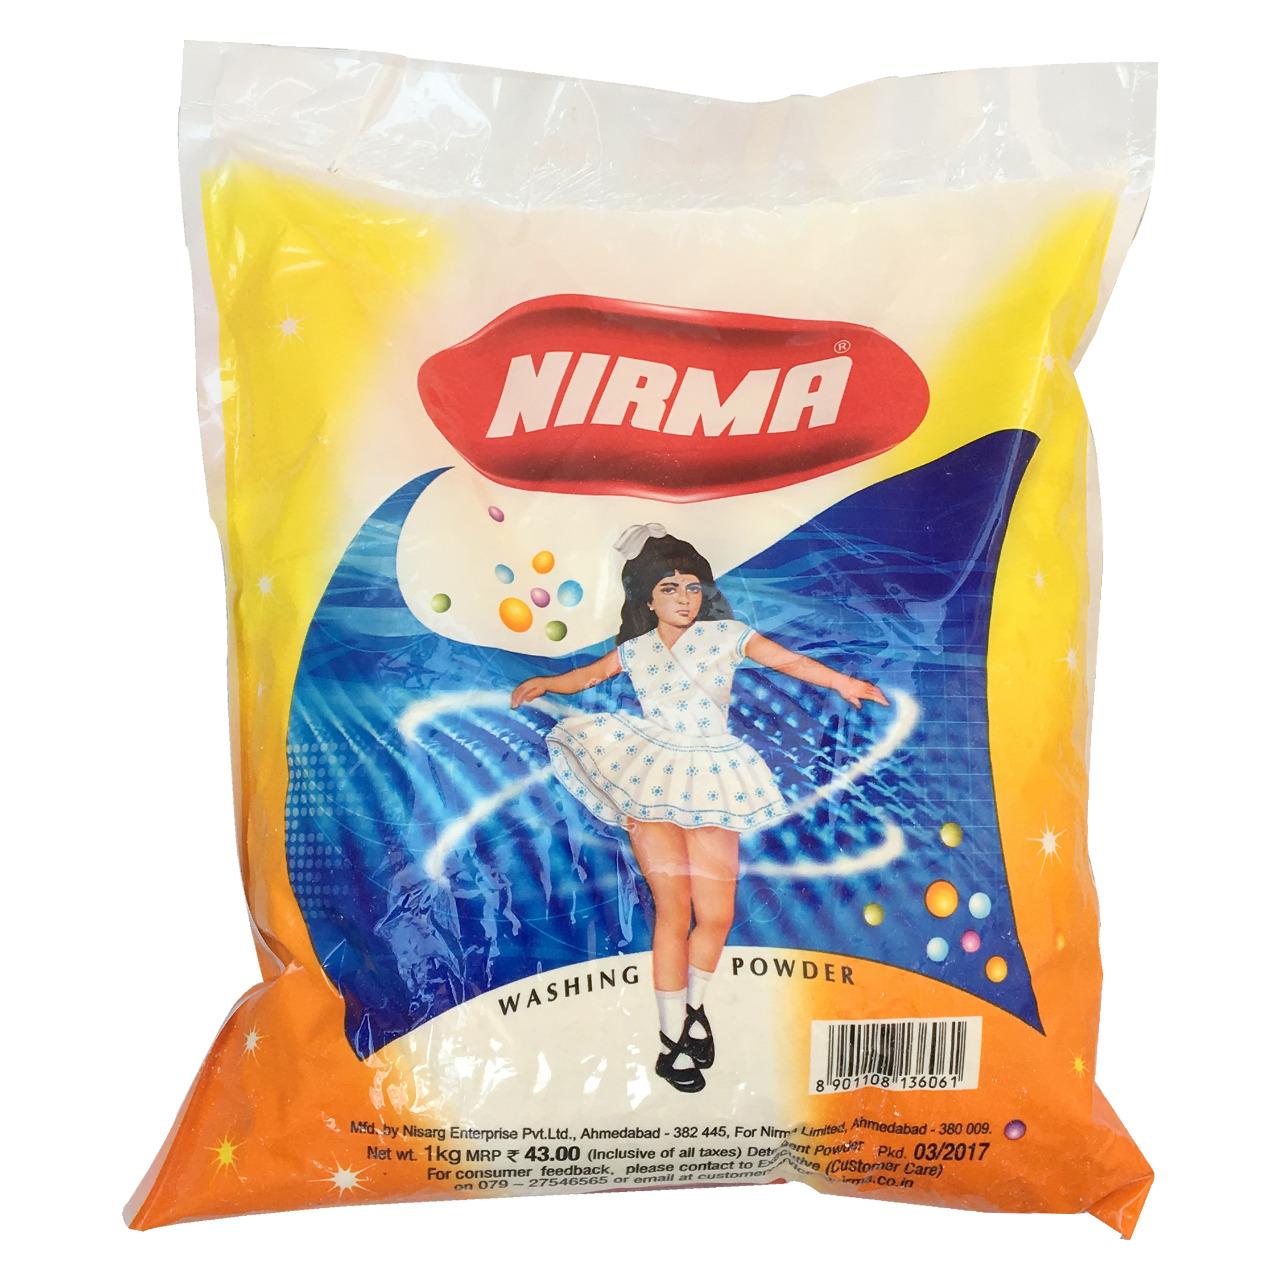 Nirma Washing Detergent Powder